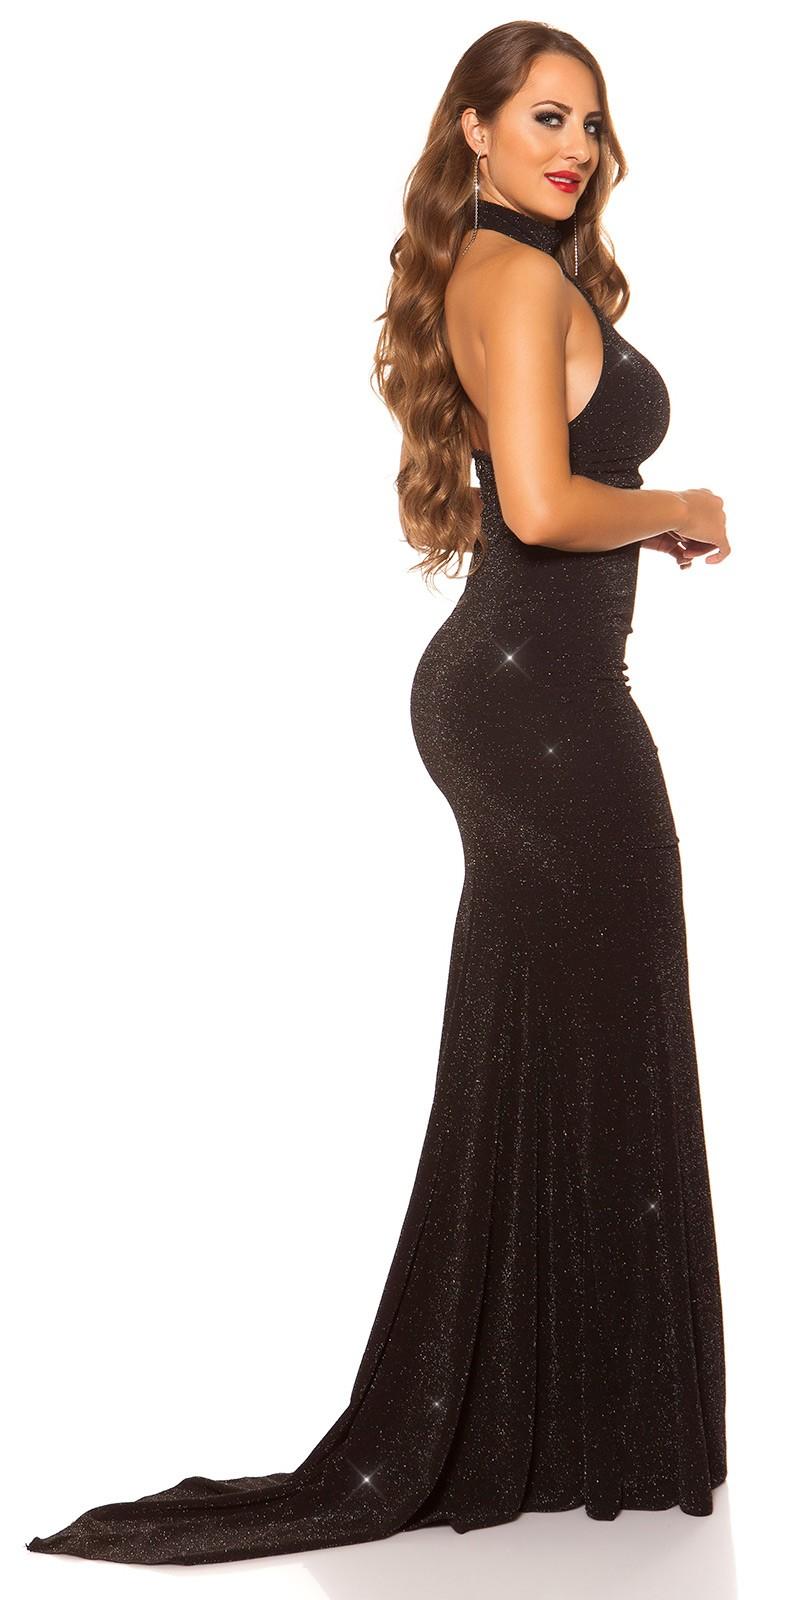 faadf662c41c eeRed-Carpet KouCla Neck-Gown with glitter  Color BLACKSILVER Size M 0000K080414 SCHWARZSILBER 23